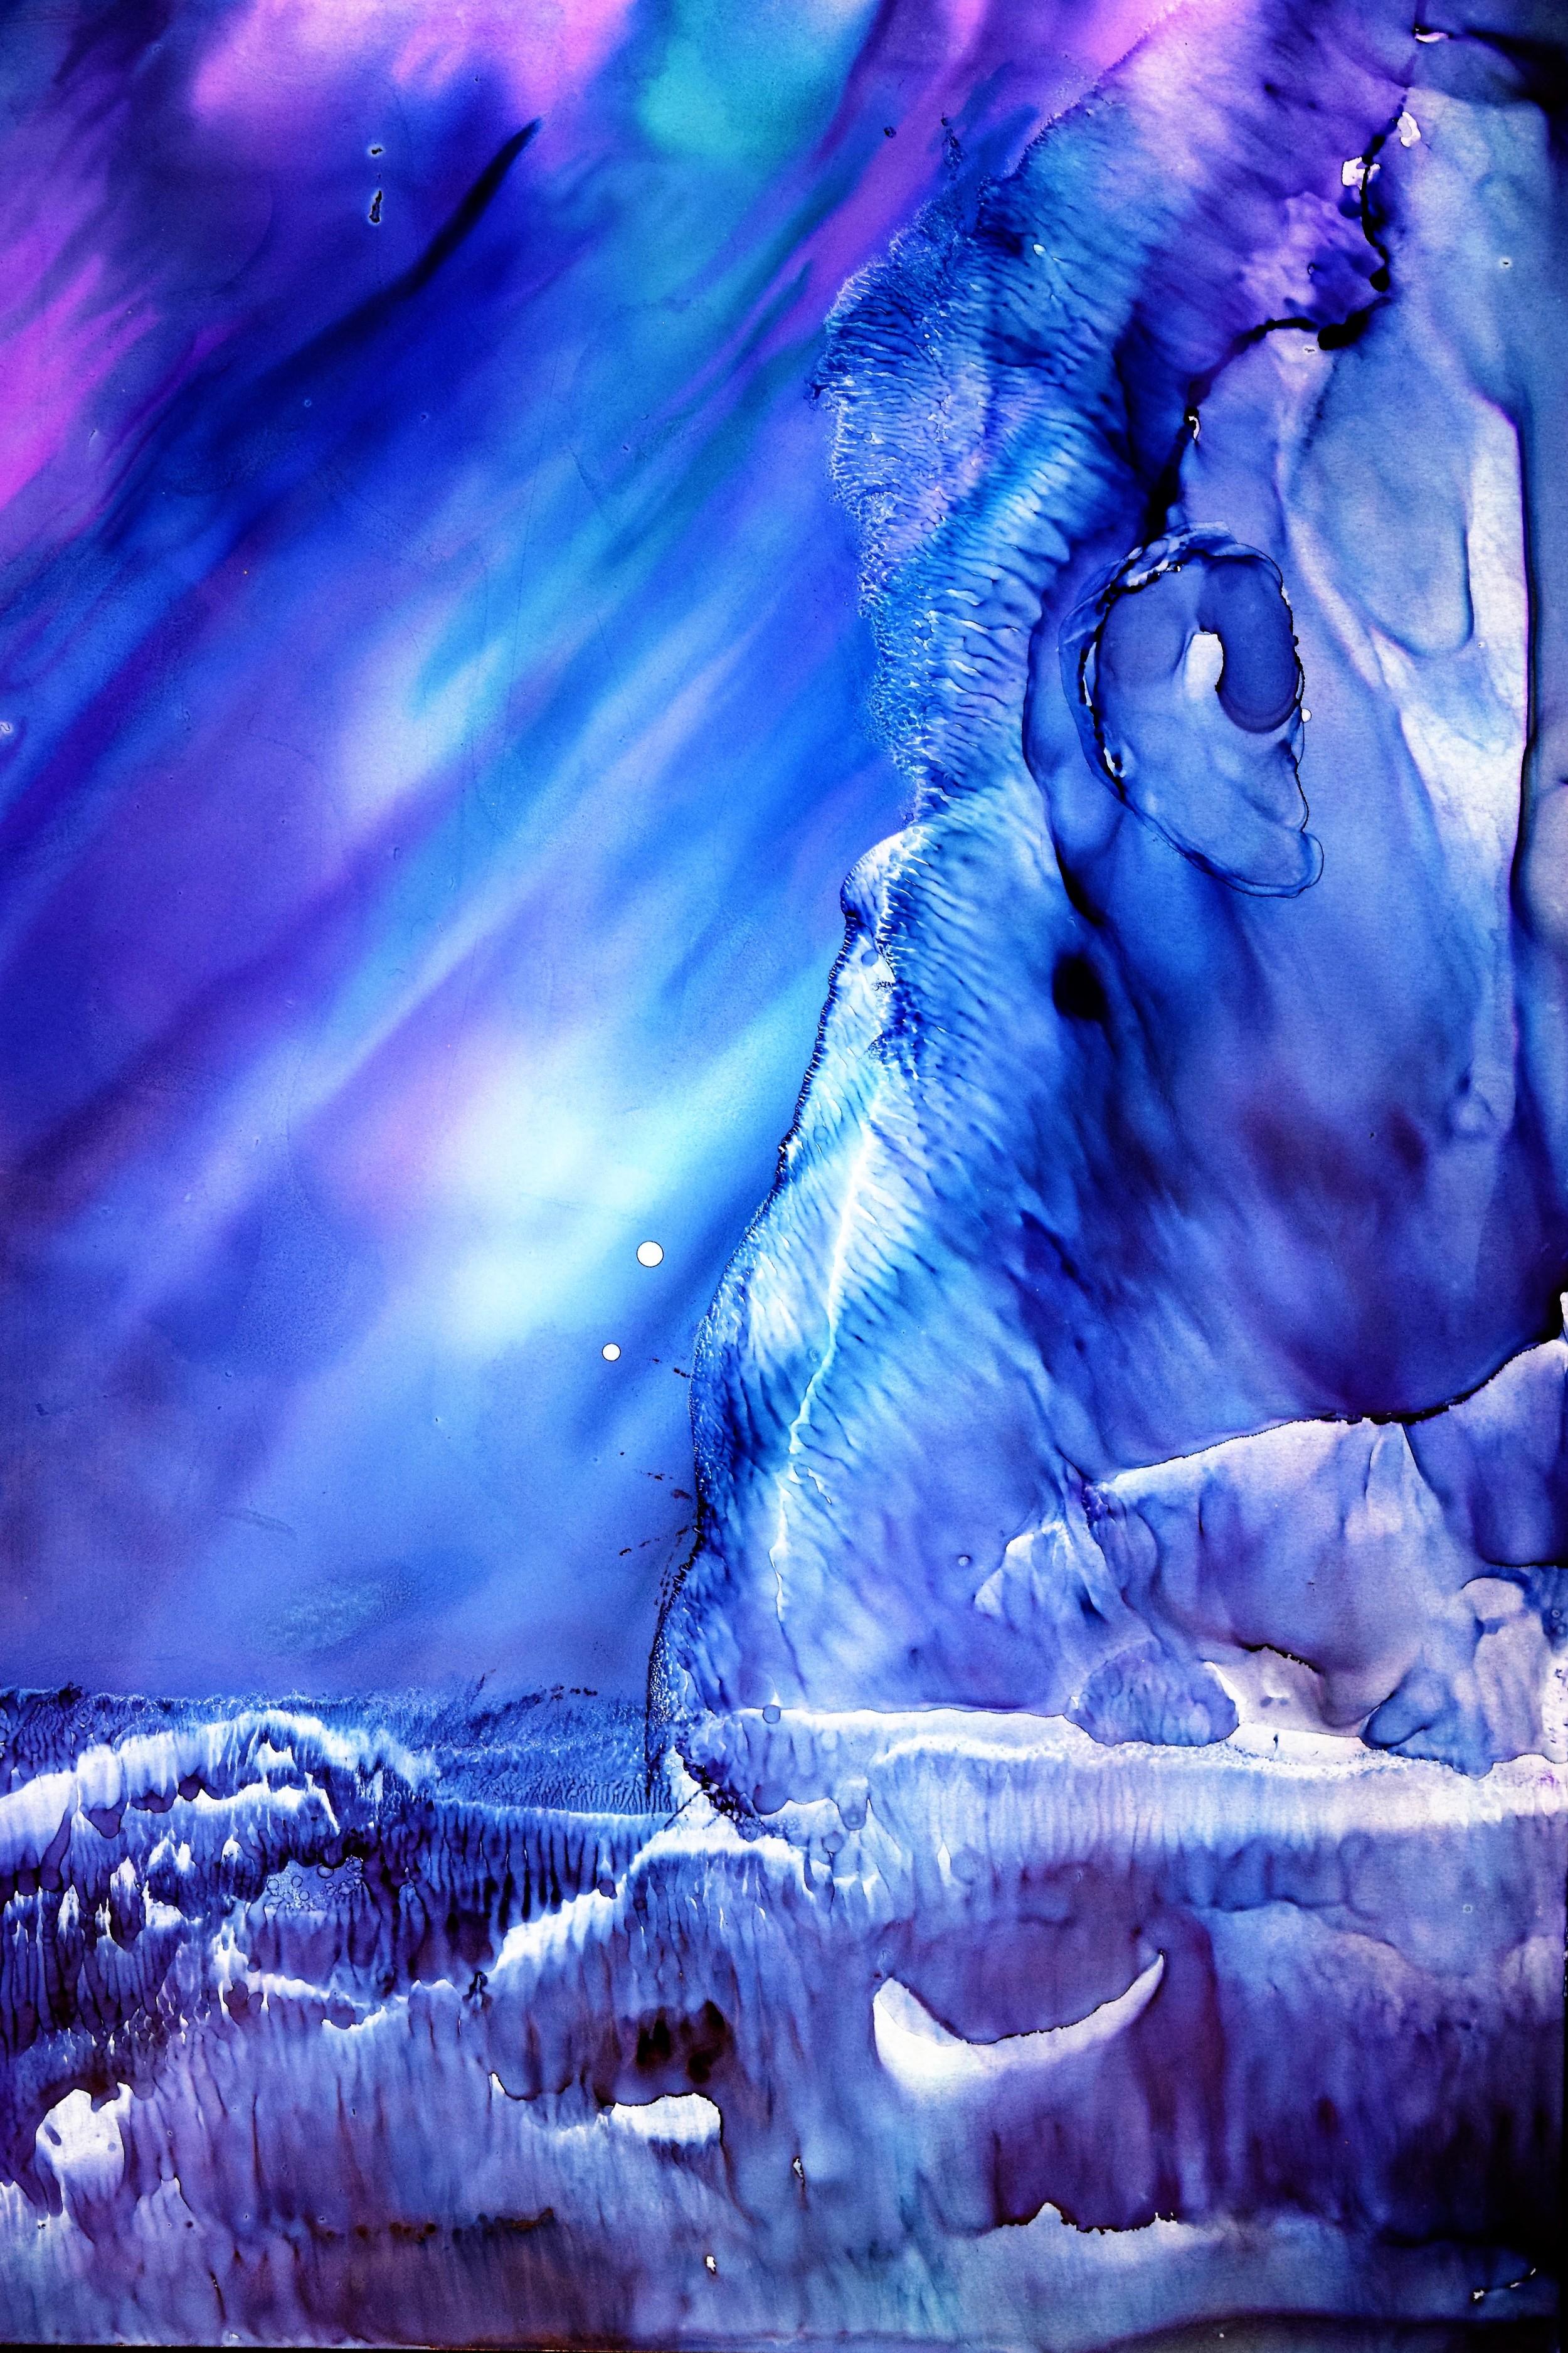 Cosmic Frozen Planet